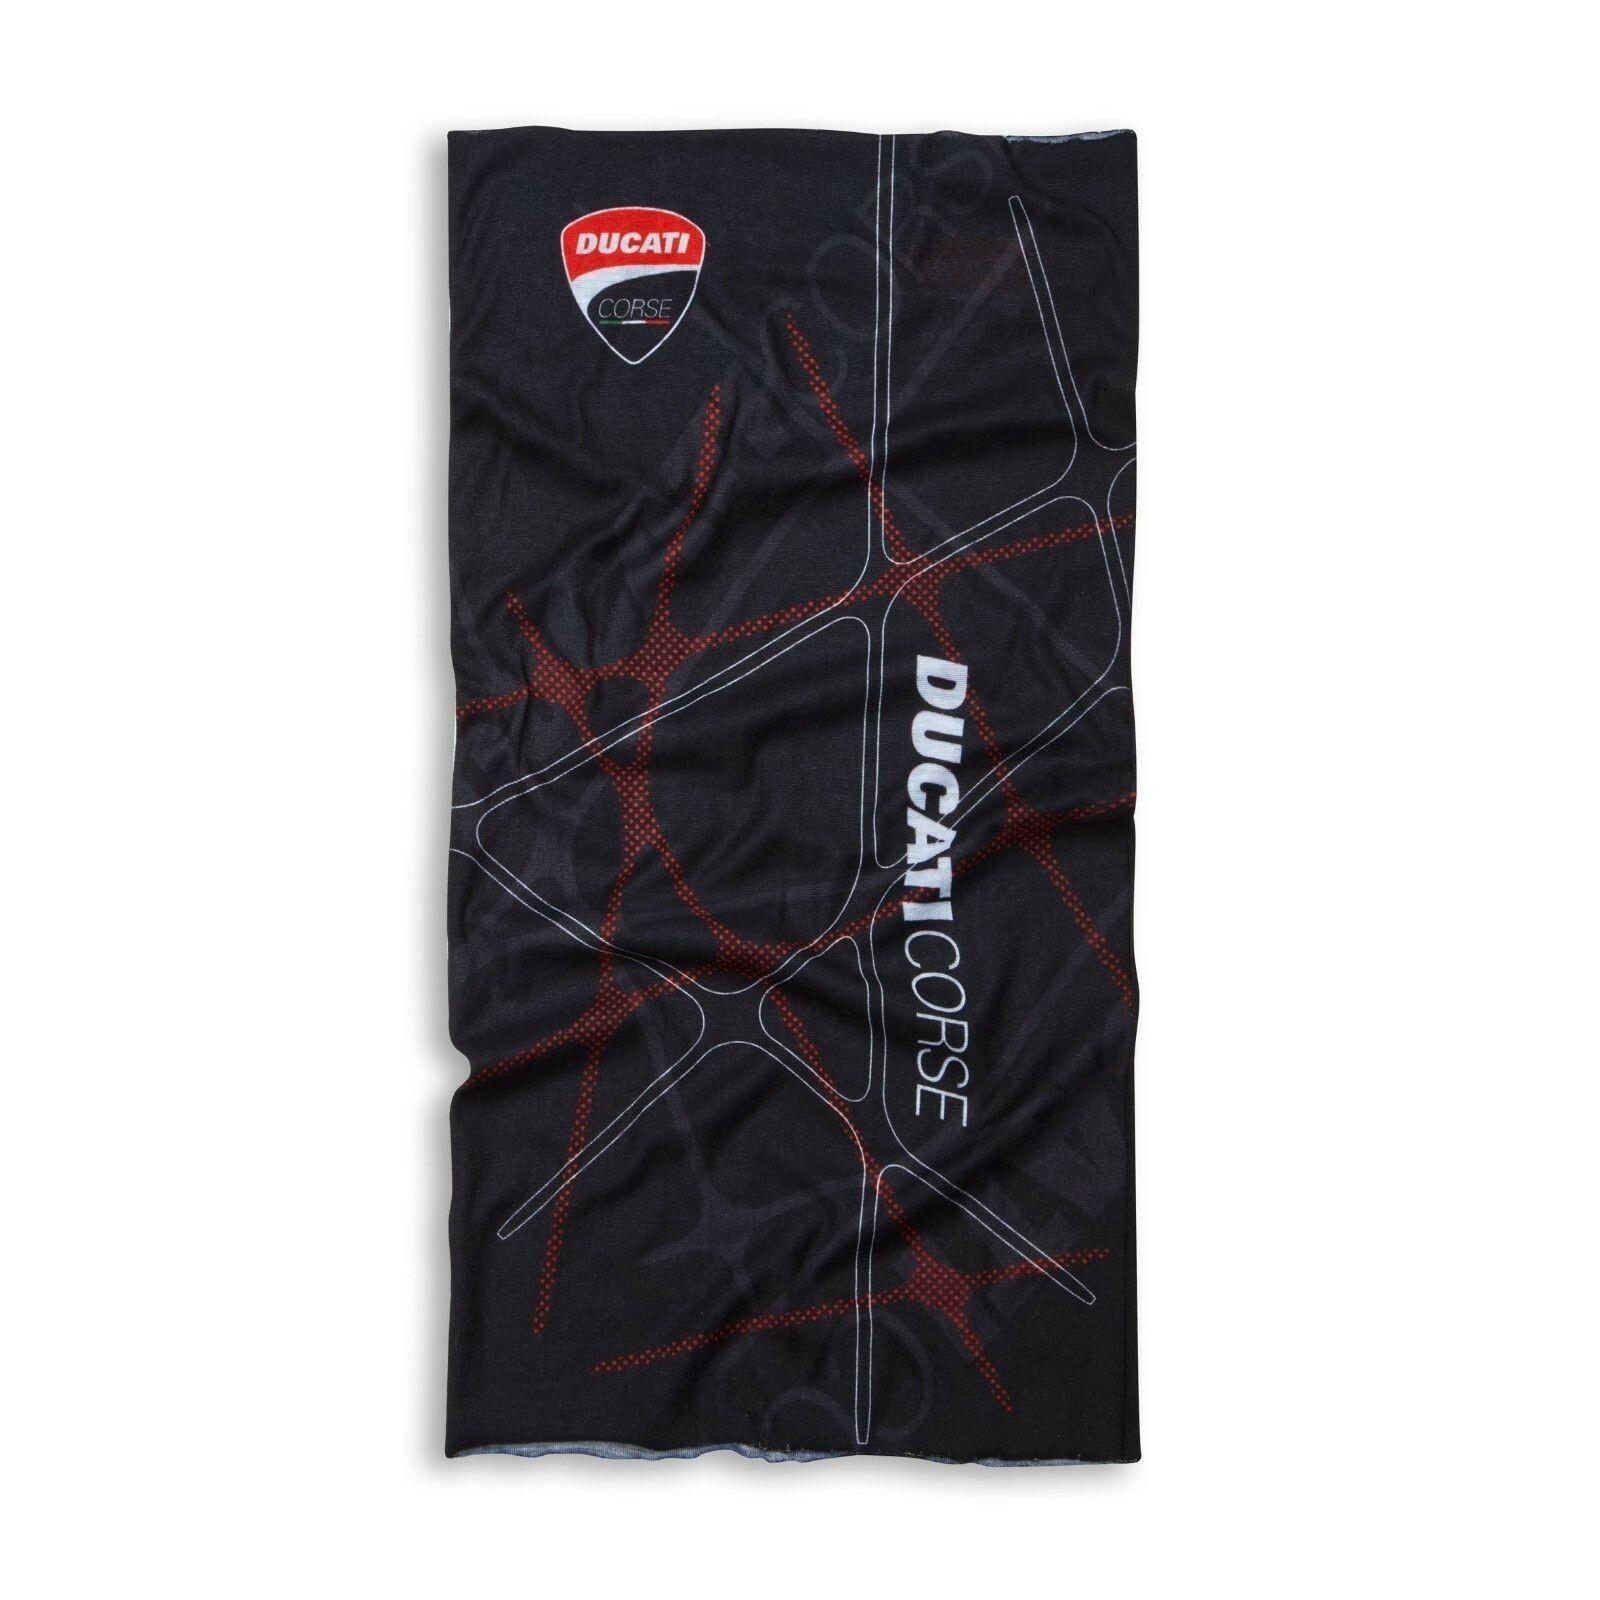 Neck warmer Ducati Corse Unisex Grey 987699430